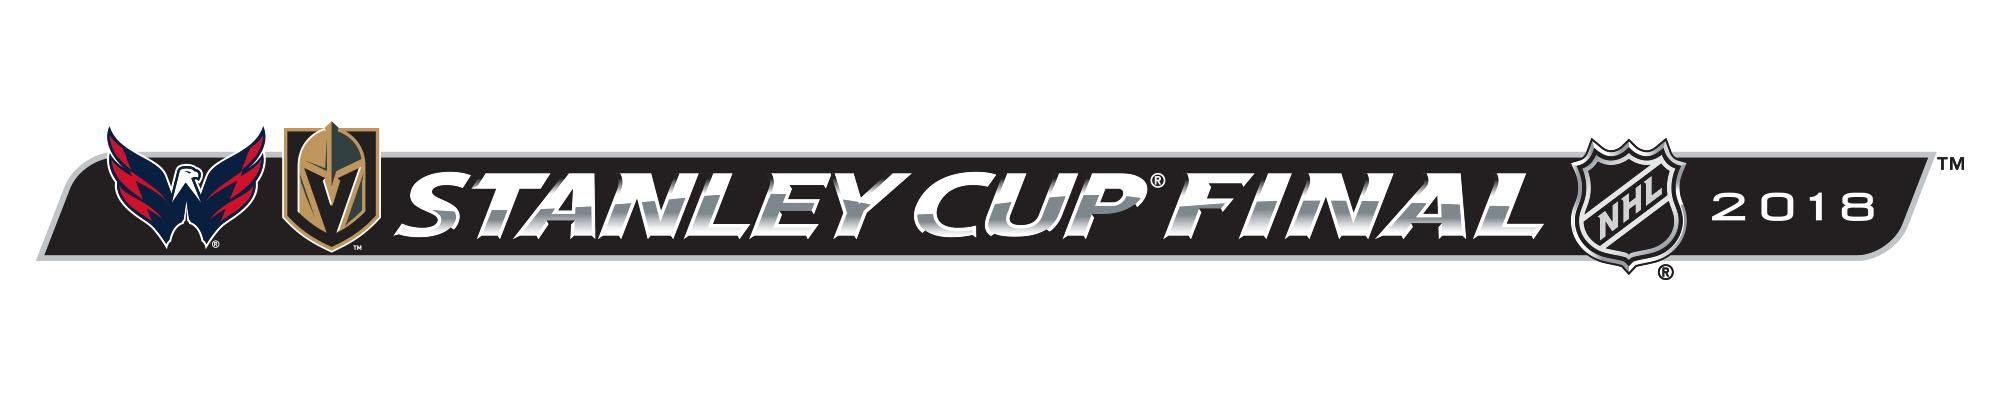 NHL_2018_StanleyCupFinal_HORZ_TeamMatchUp_WSHvVGK.jpg